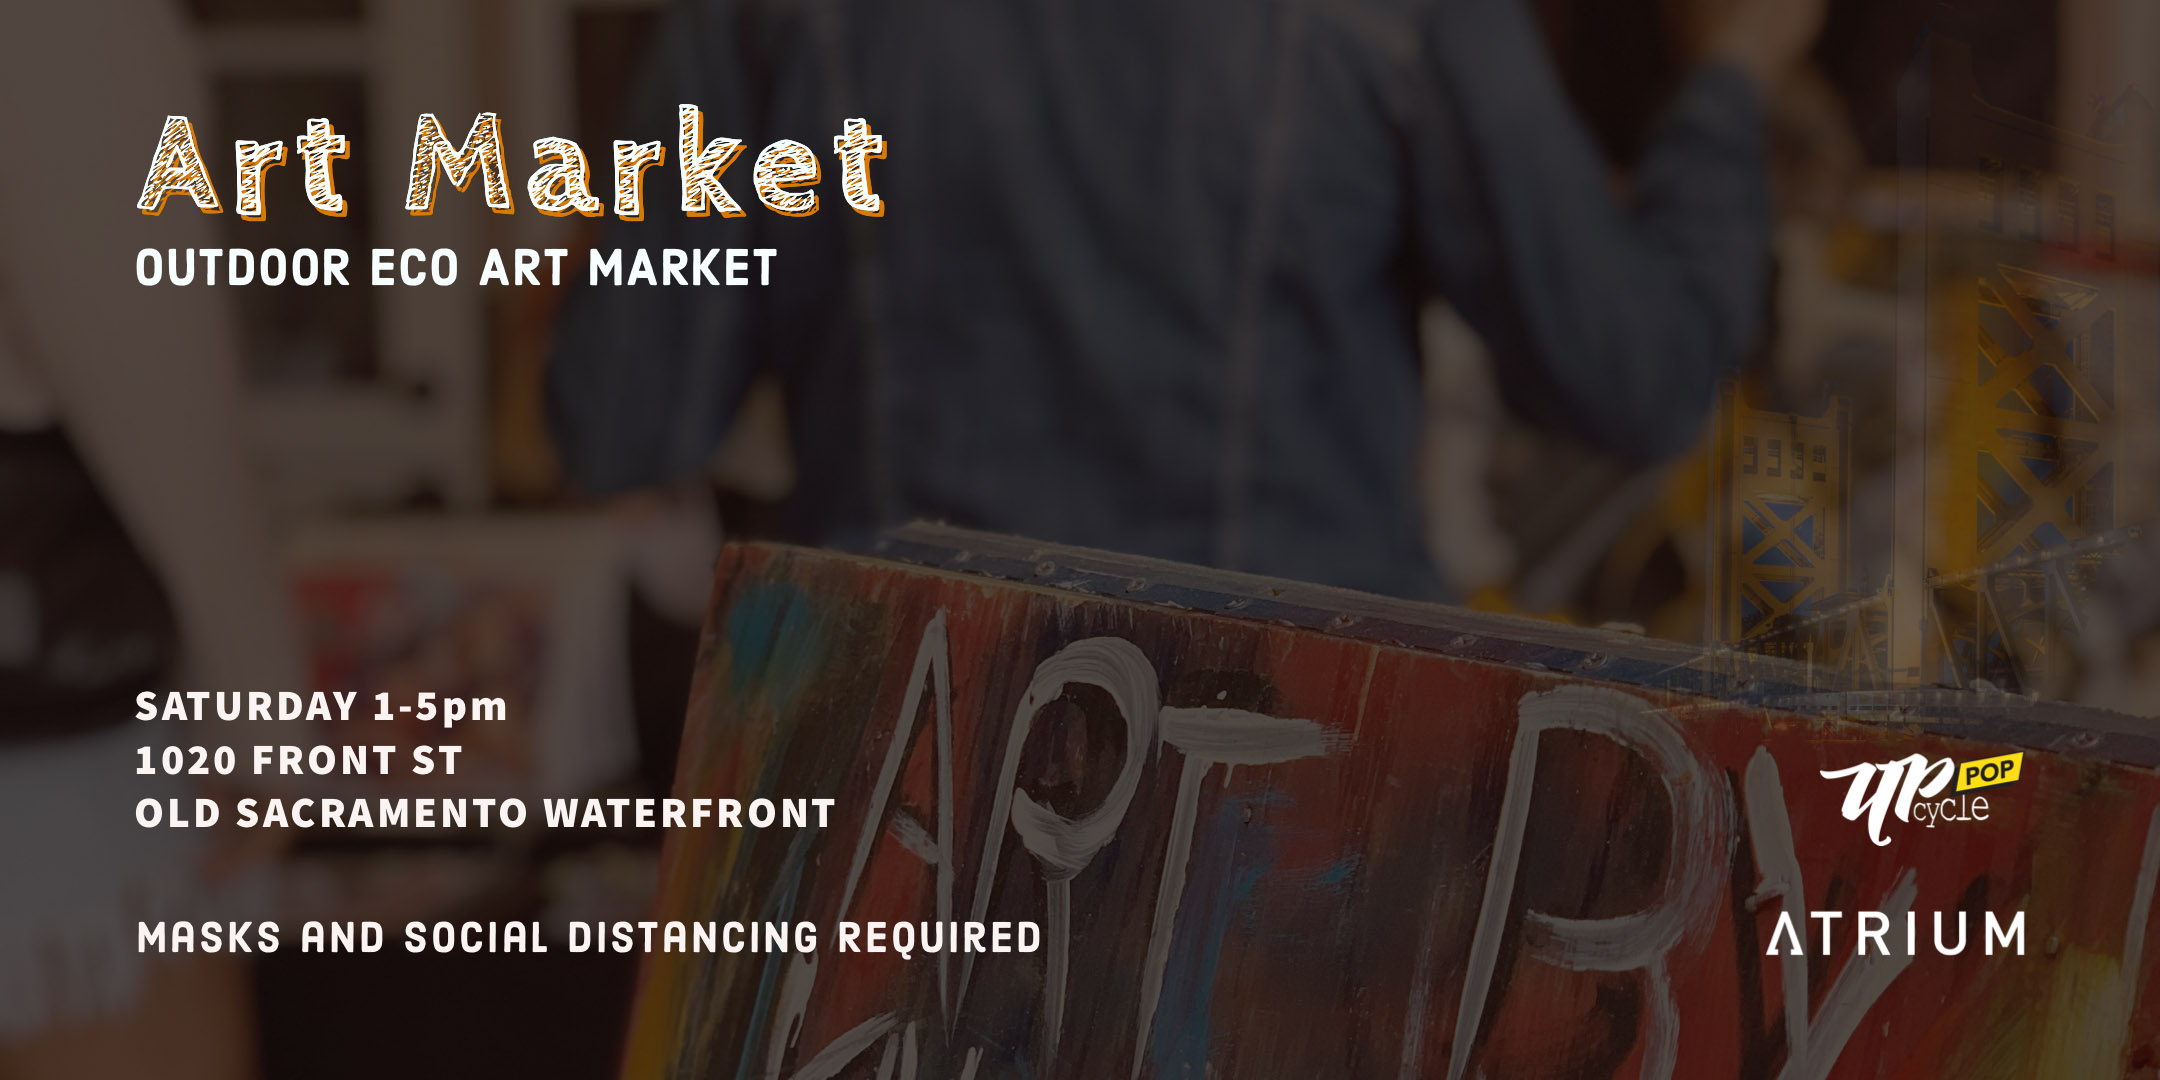 upcycle pop sacramento art market